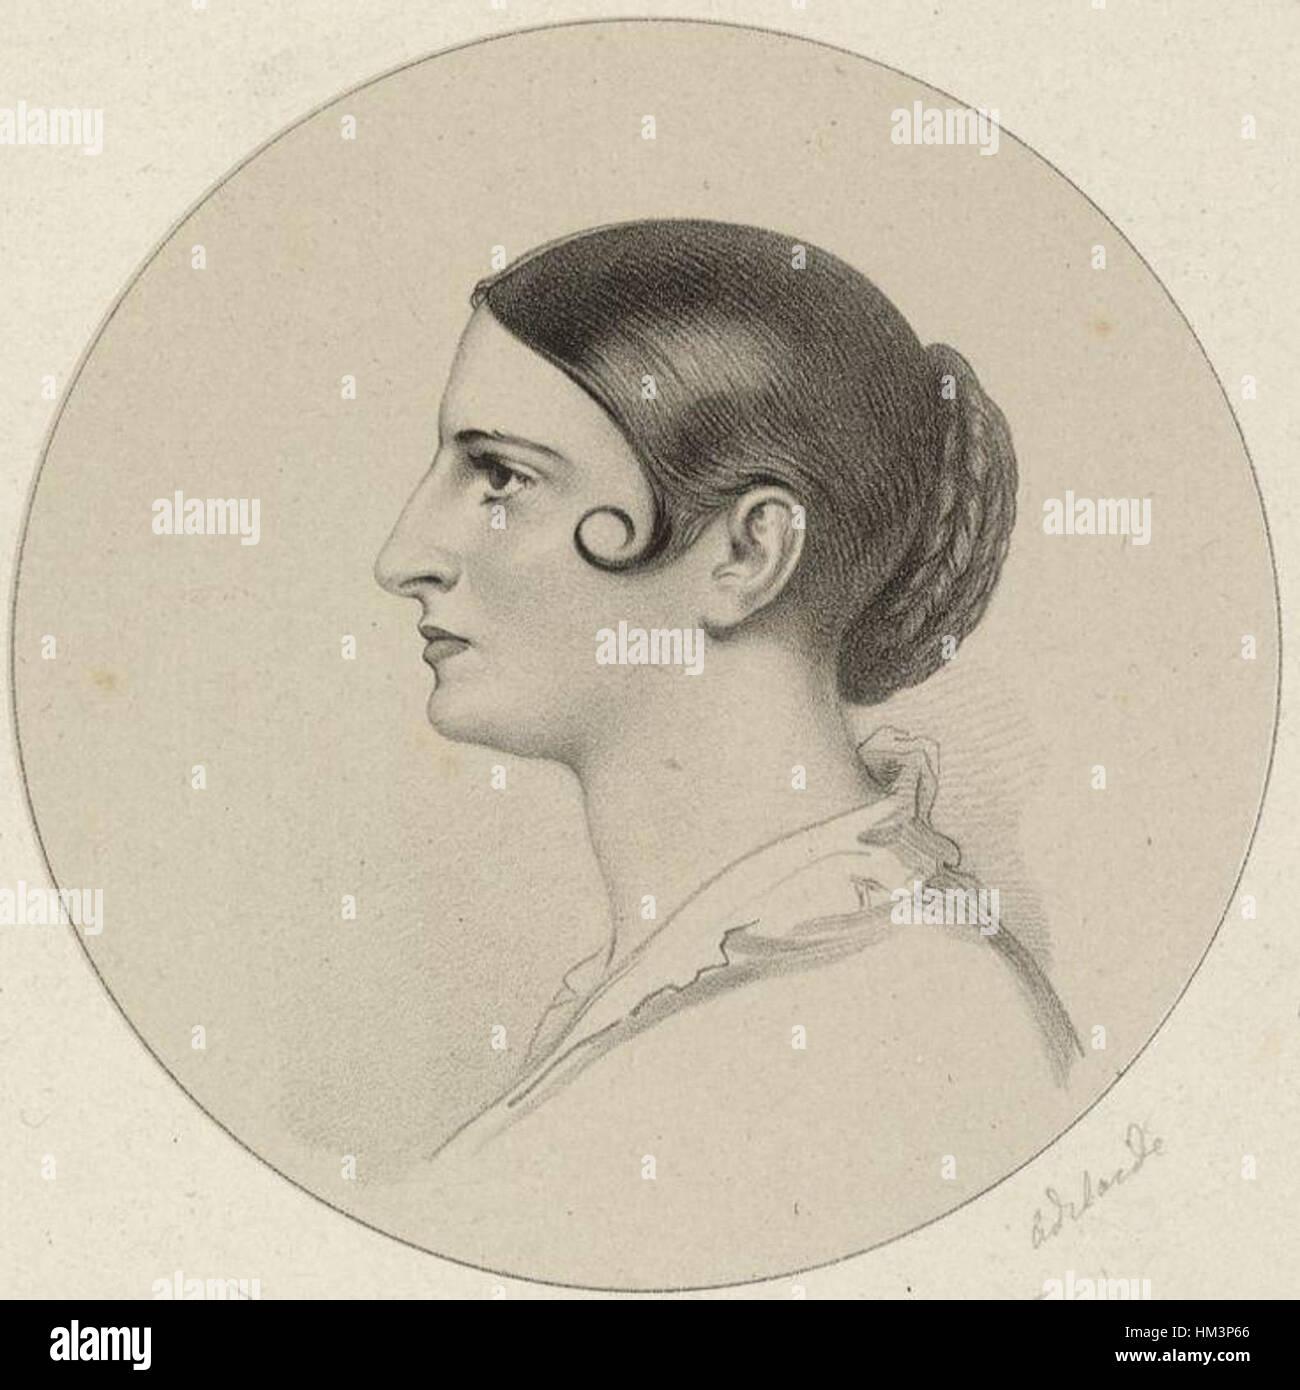 Adelaide Kemble by Richard James Lane - Stock Image